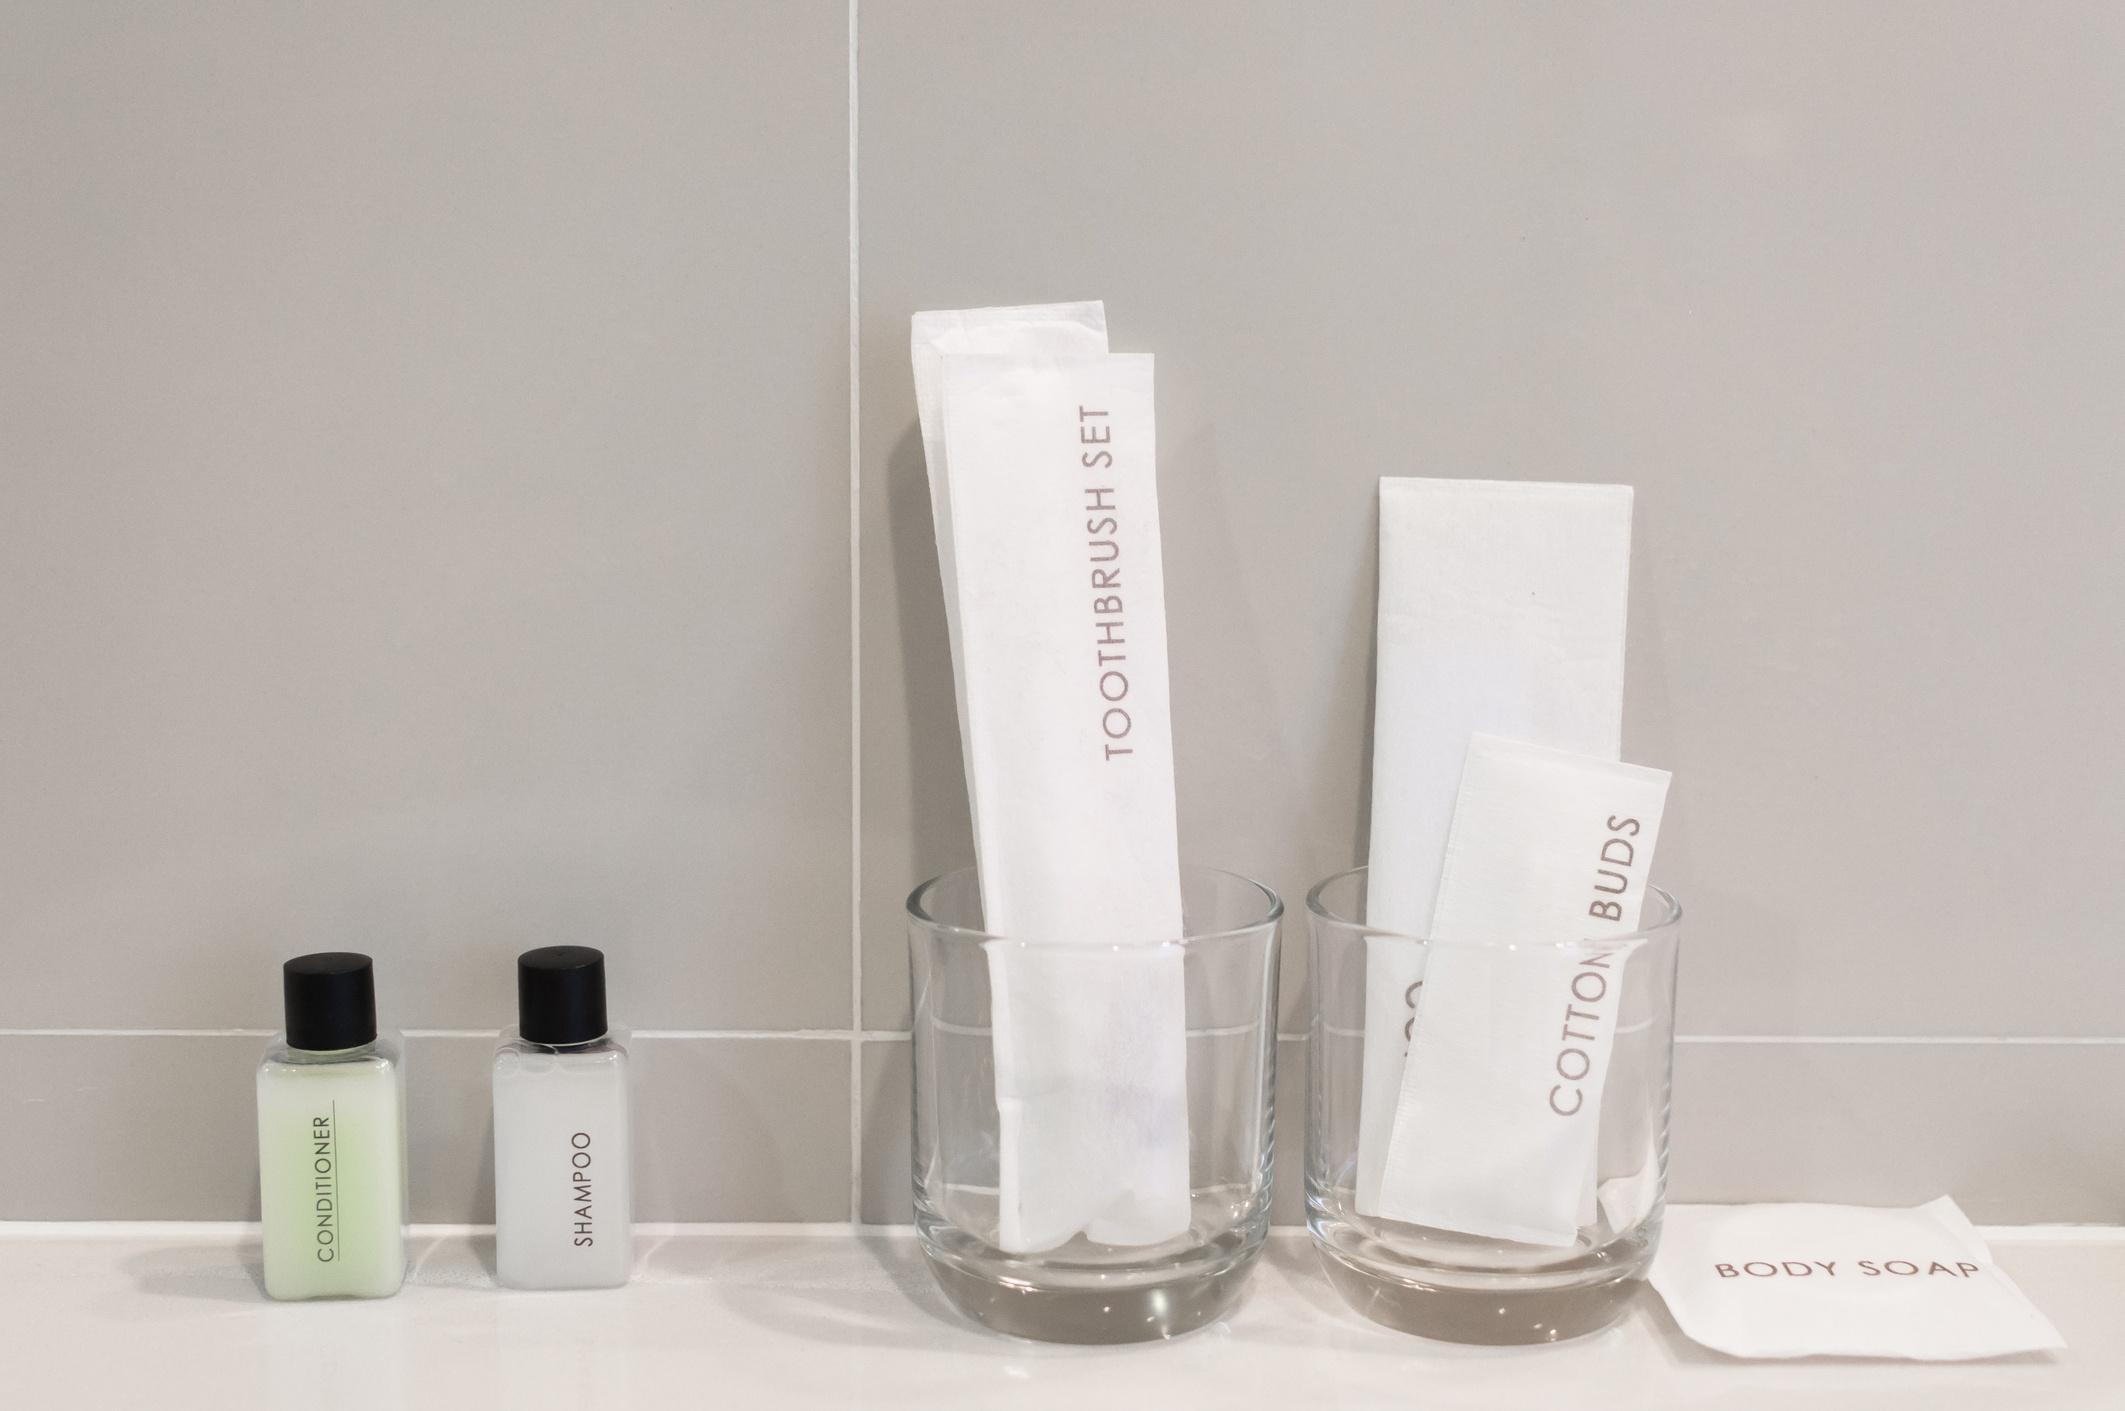 Amenities kit in bathroom the hotel